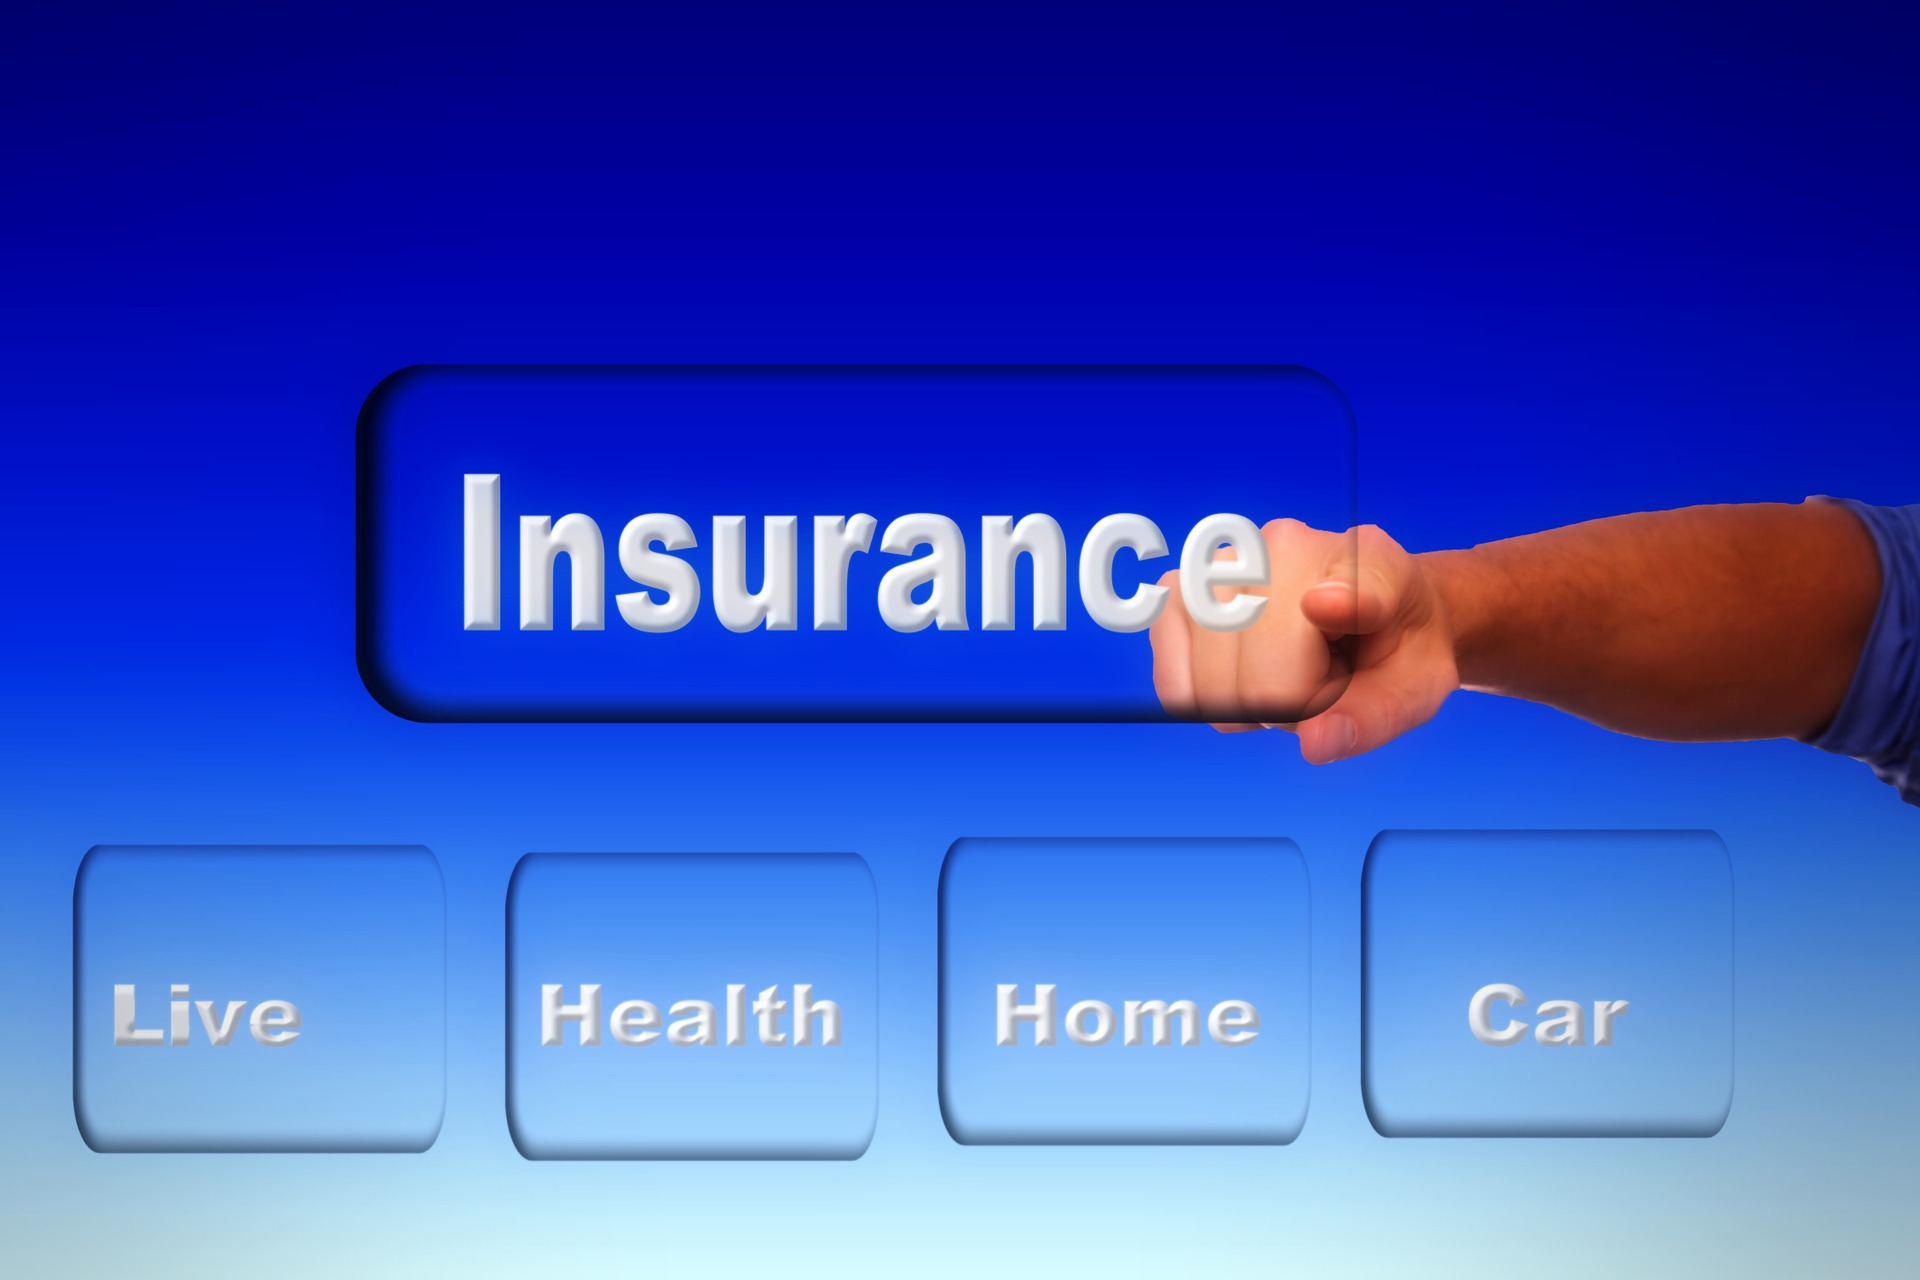 Marketplace Insurance